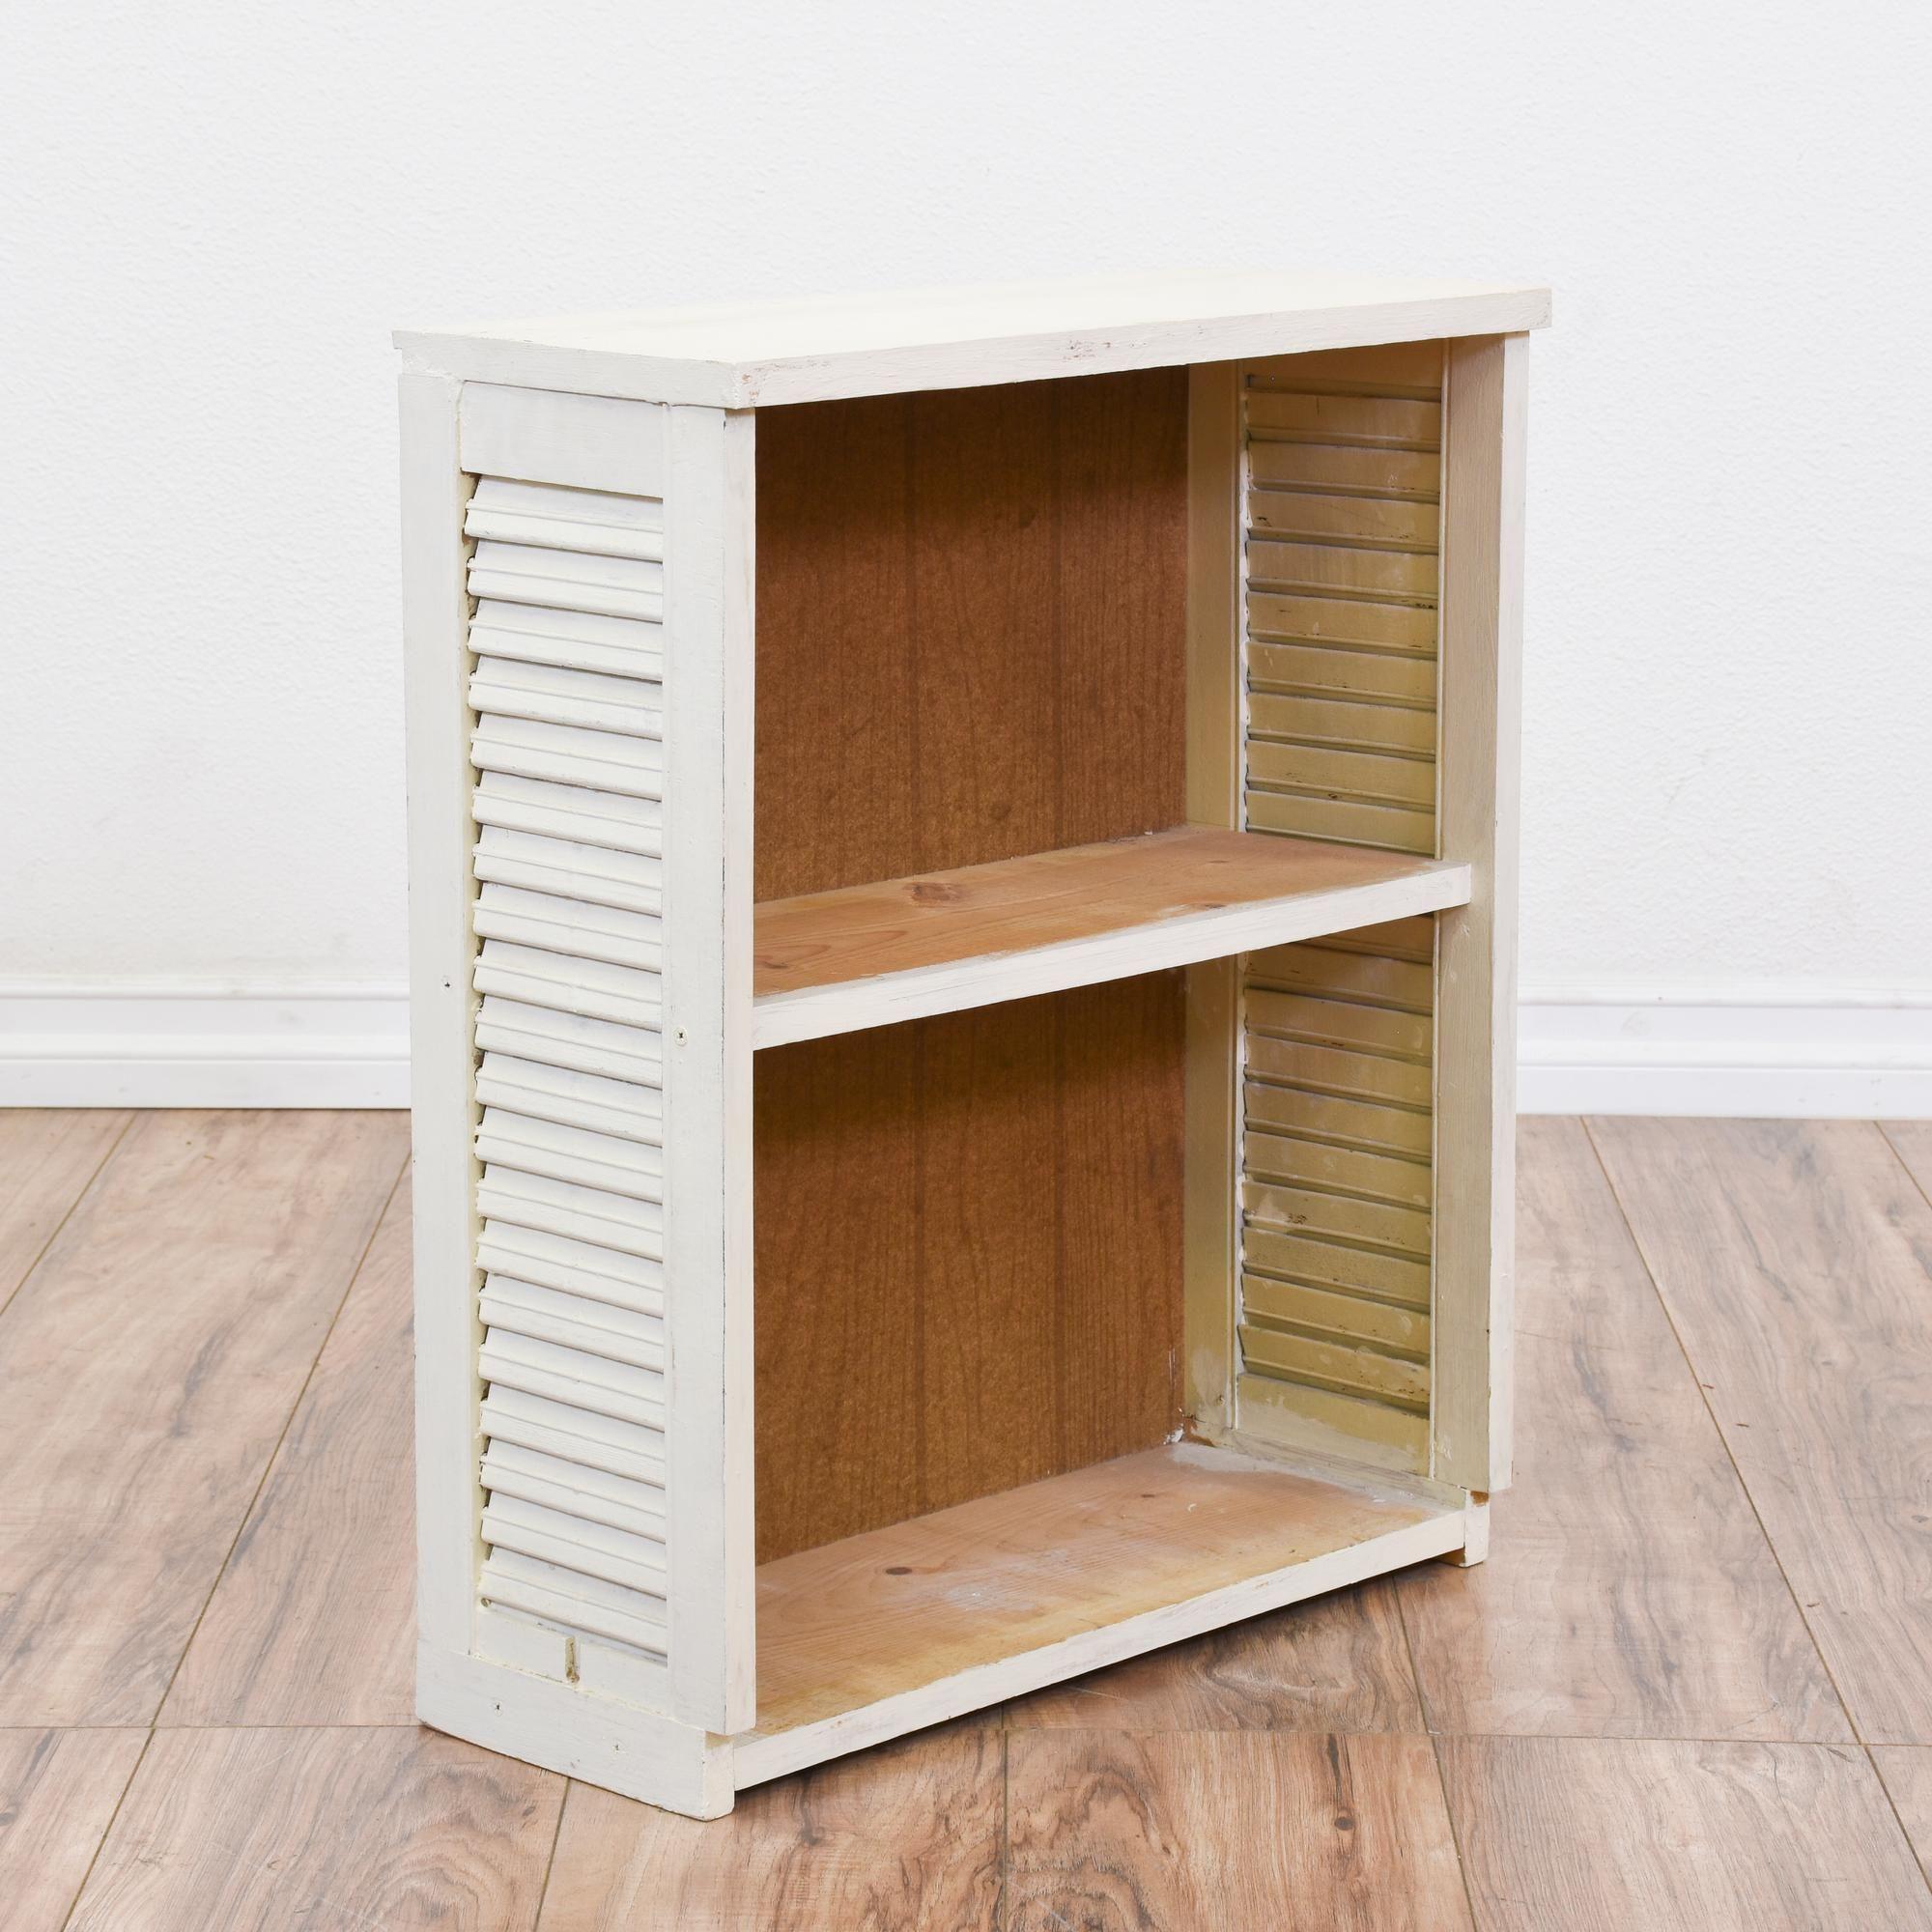 White Shabby Chic Shutter Bookcase | Shelves, Shabby chic bookcase ...